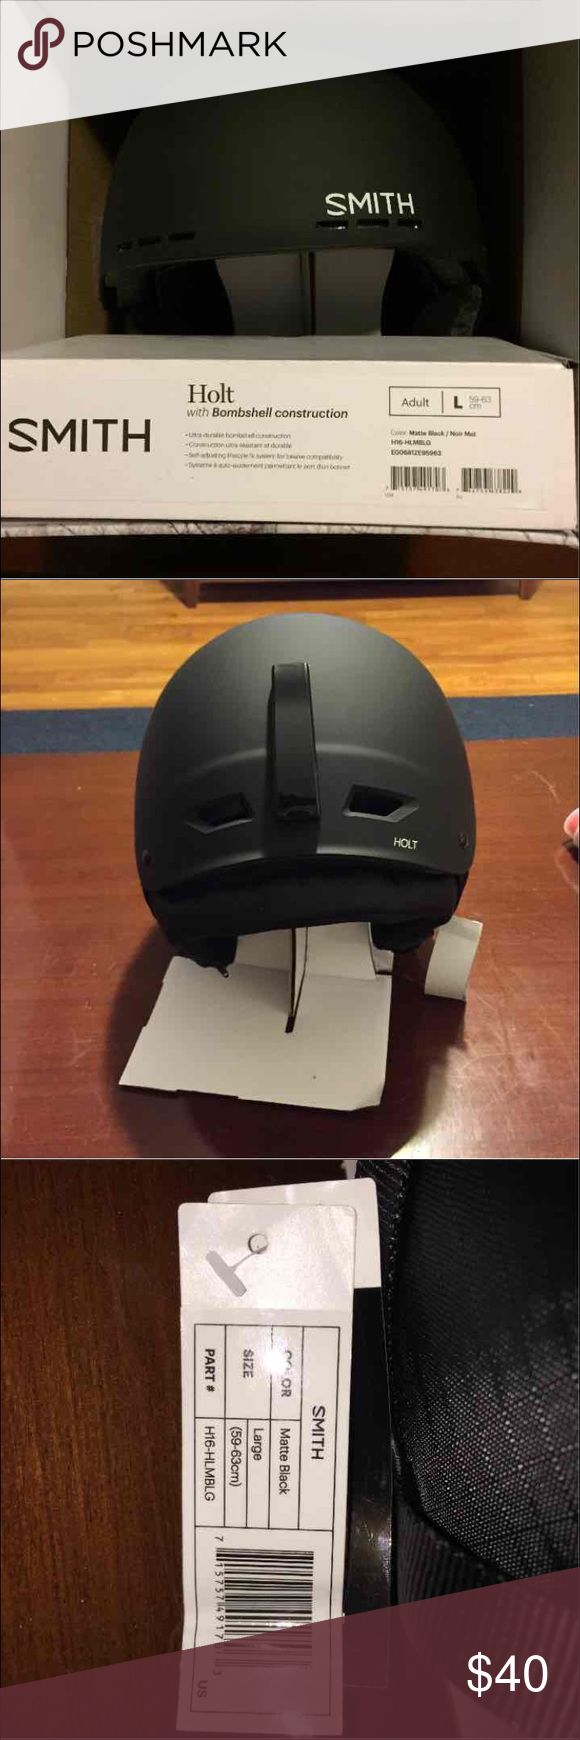 Smith Holt Ski/Snowboard Helmet Brand new unused ski/snowboarding helmet. New with tags, in box. Unisex. Smith Other